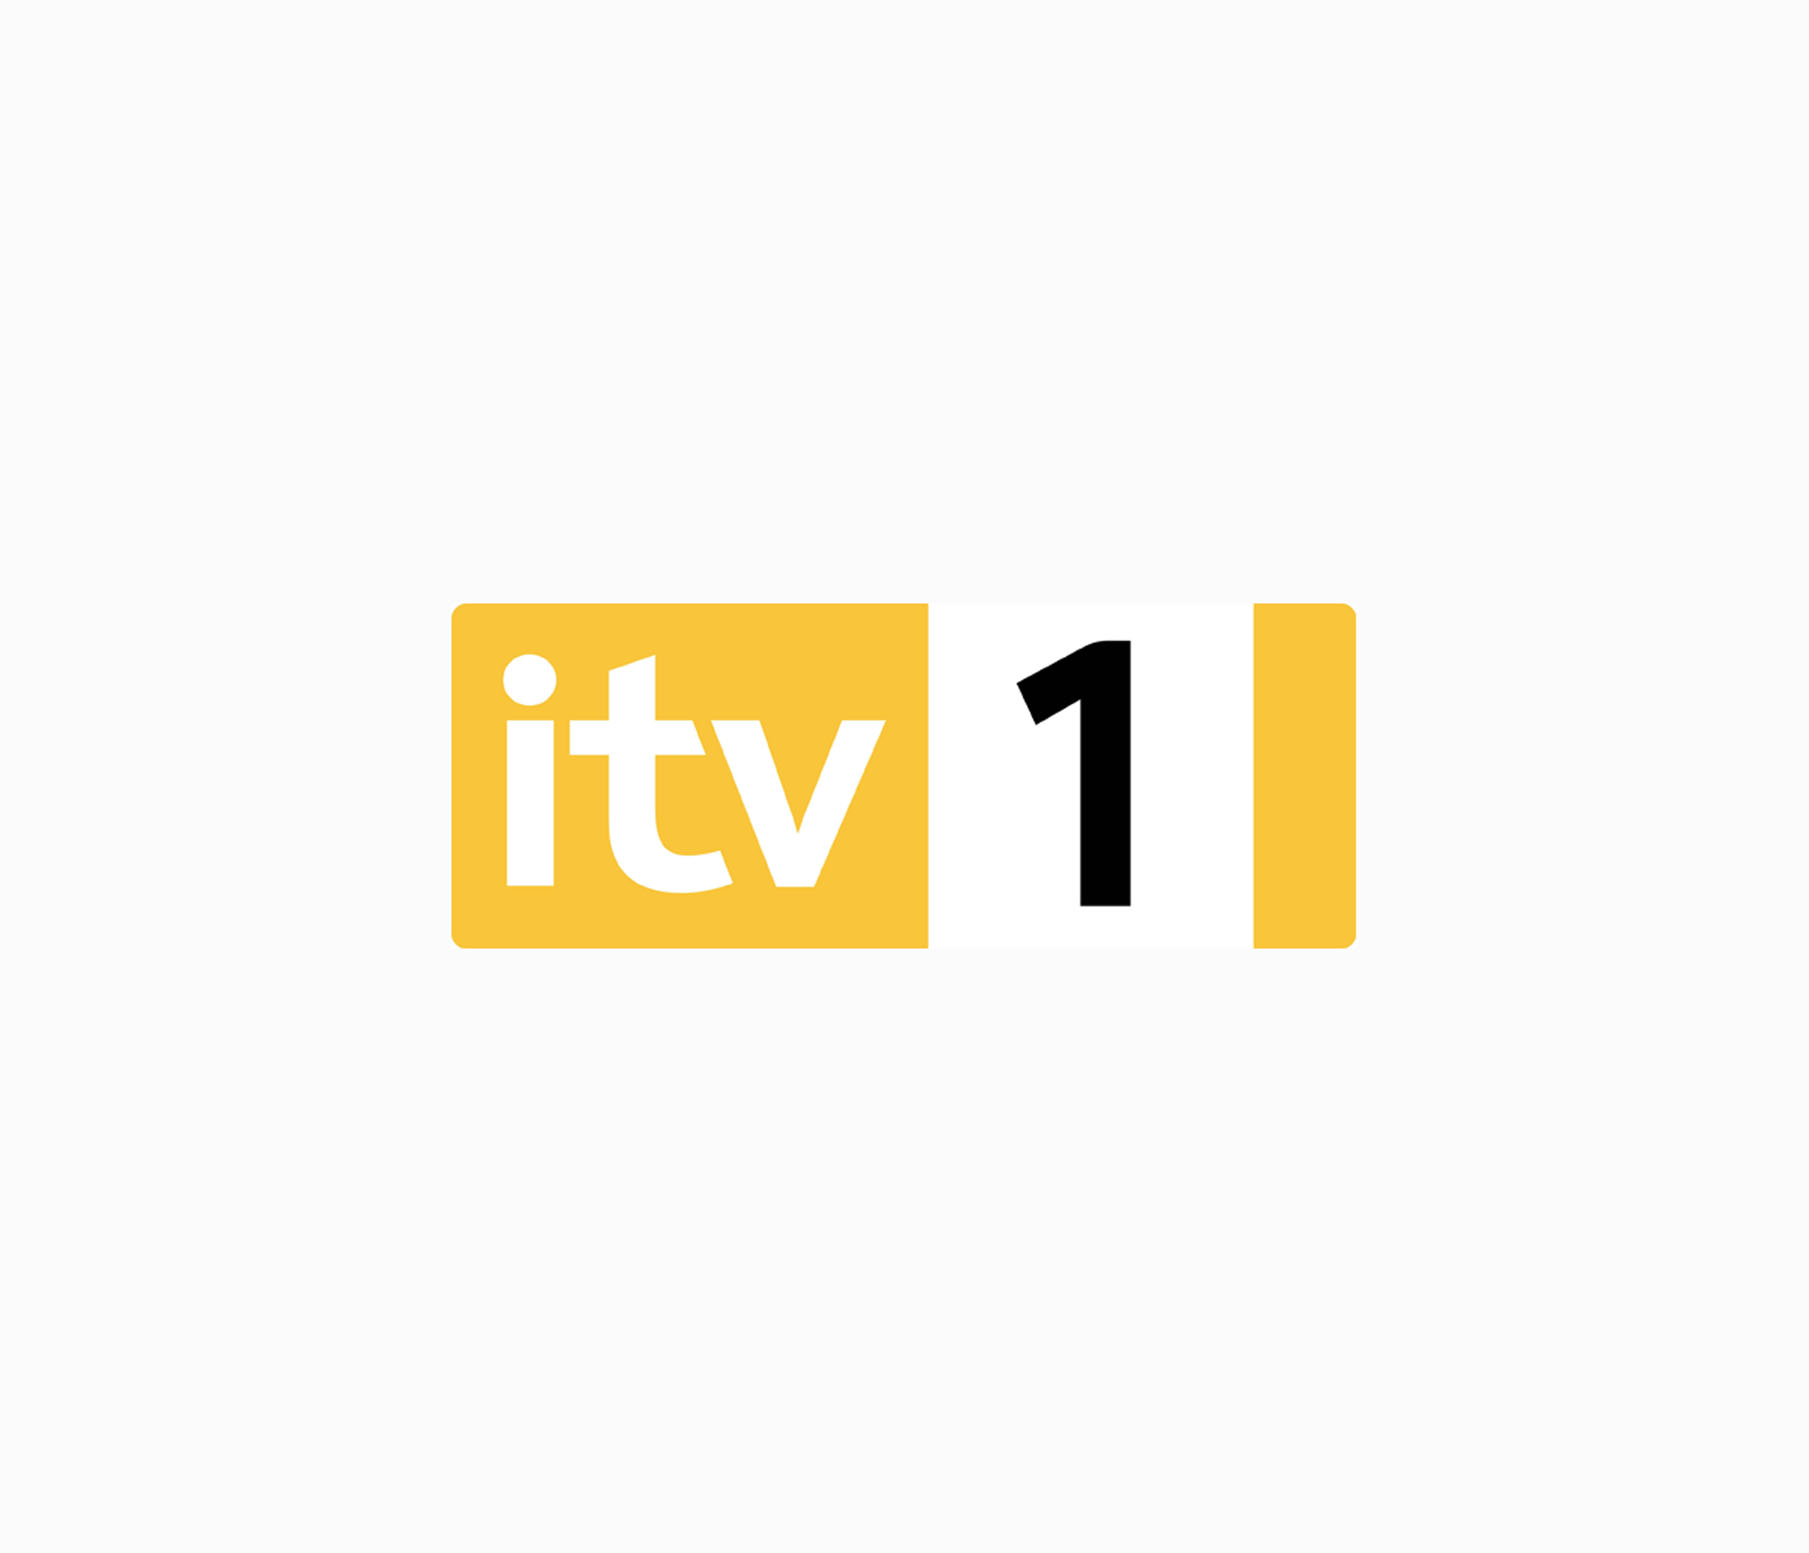 The Biggest Loser (UK TV series) - Howling Pixel